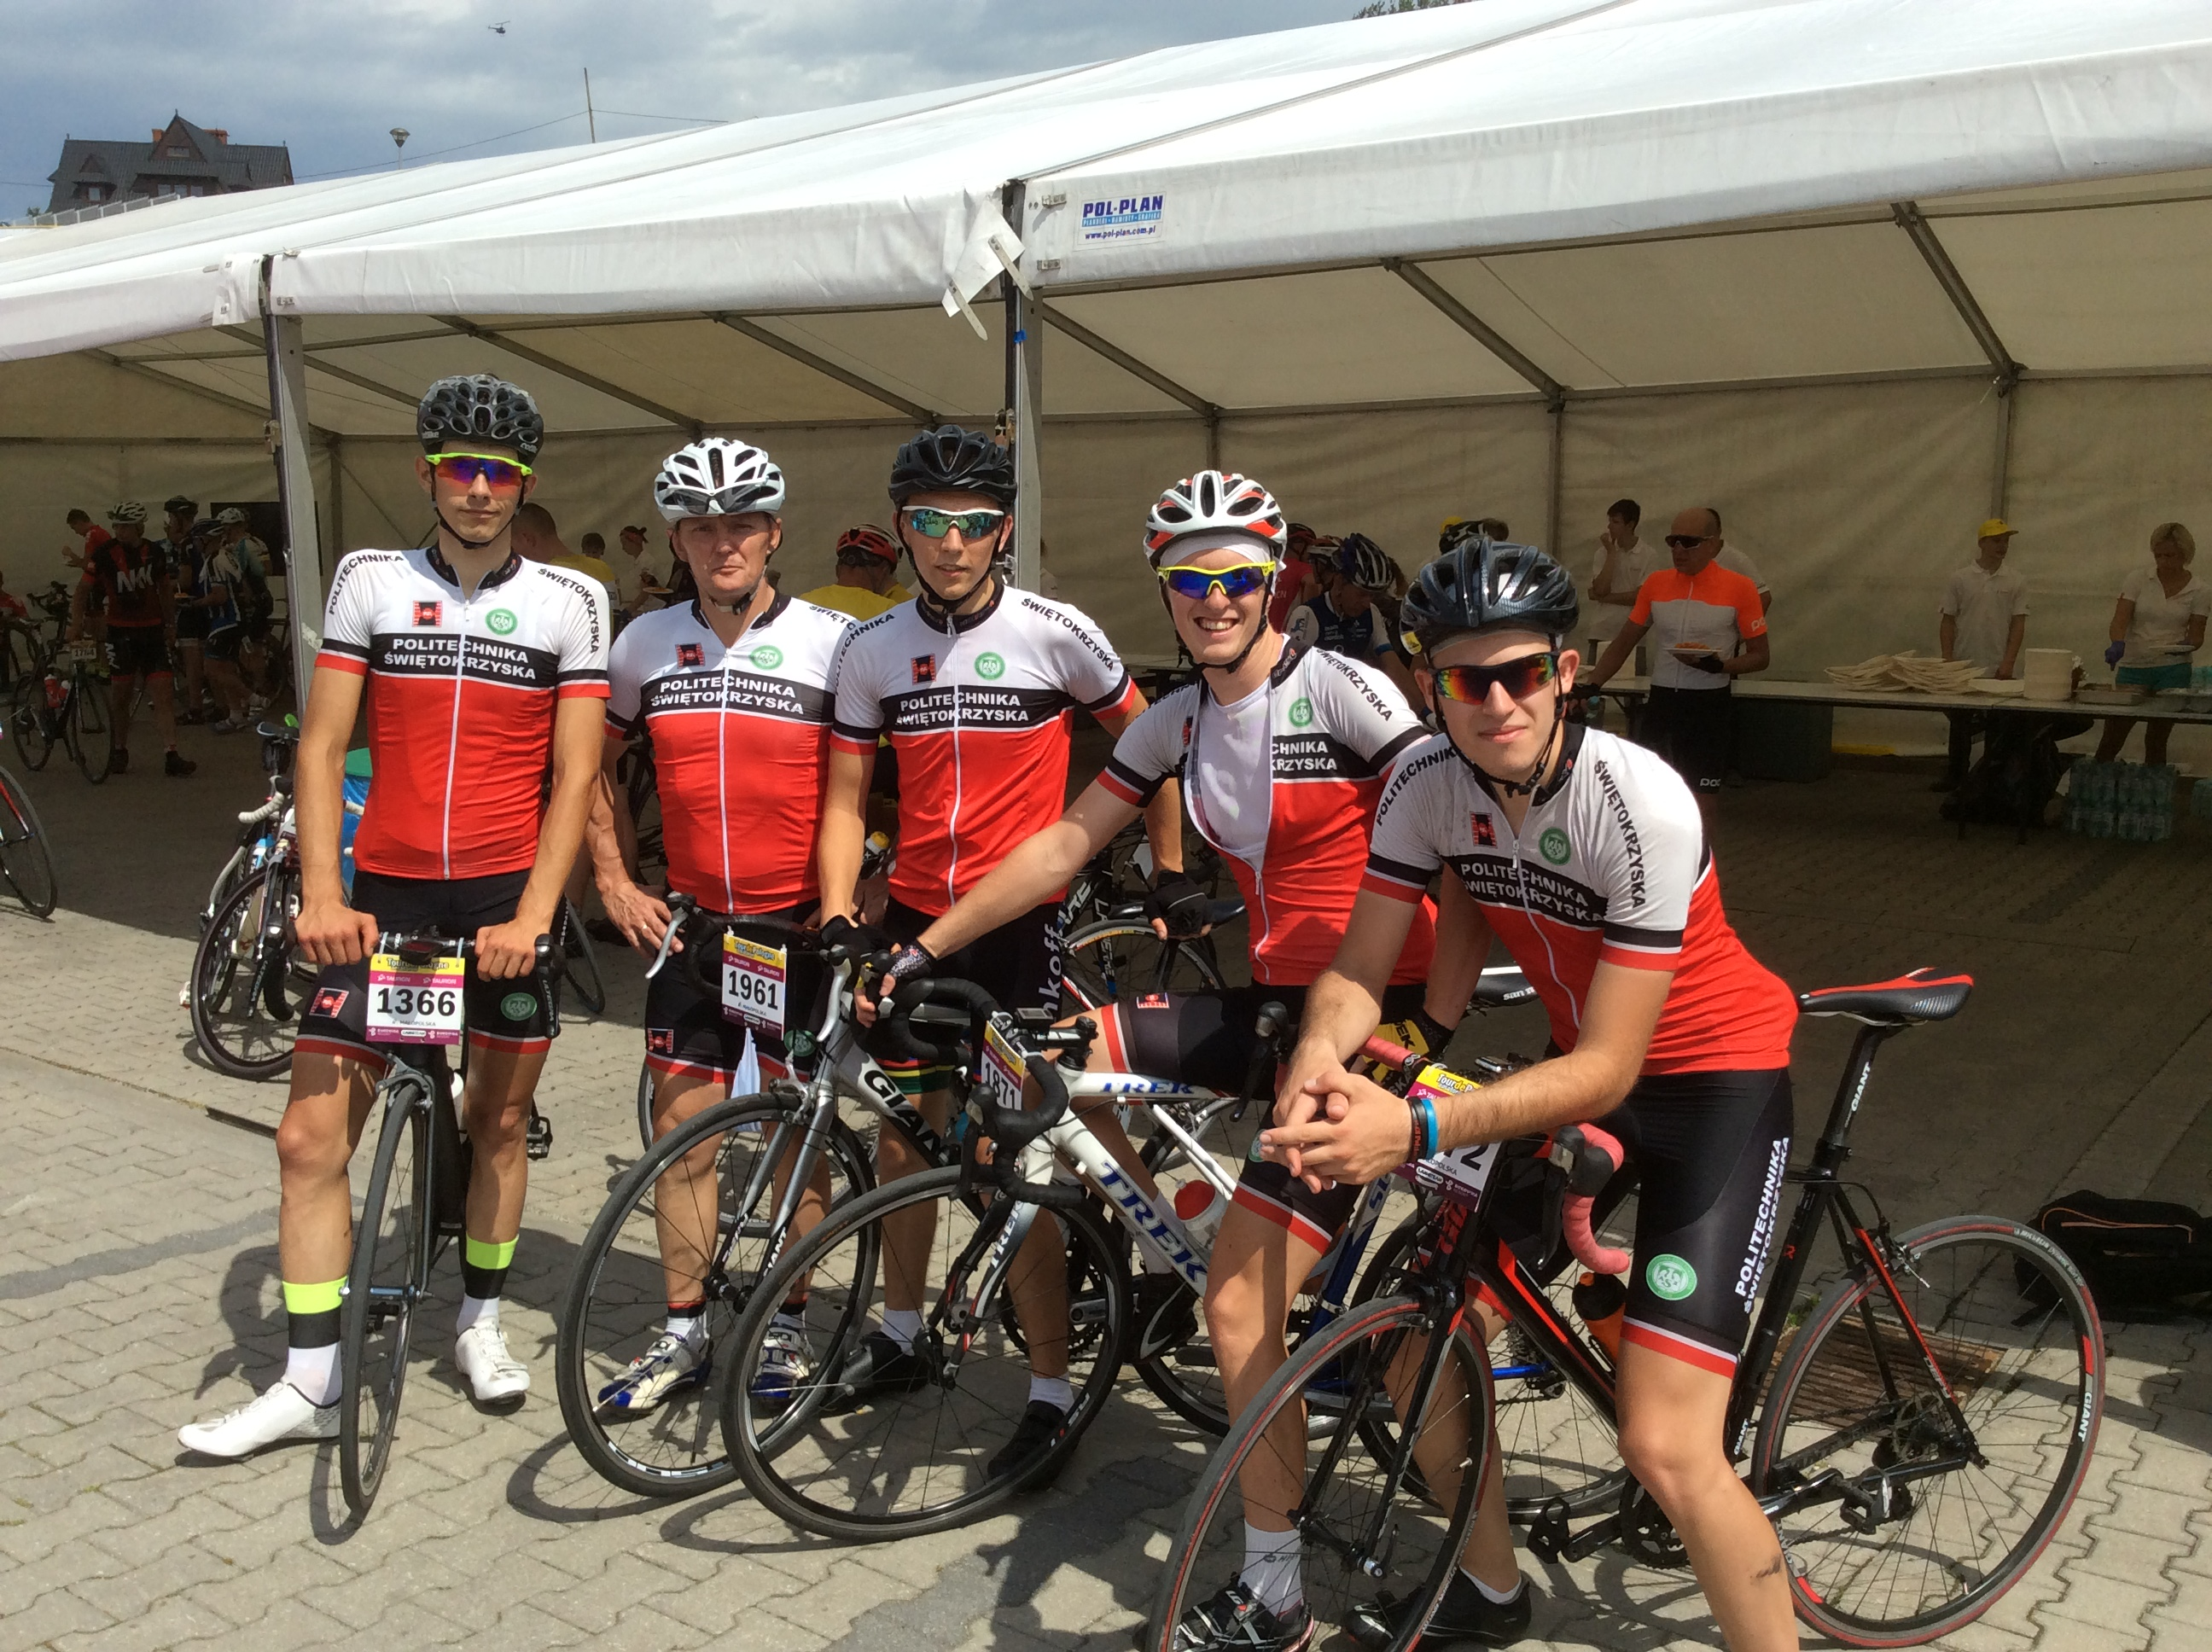 Studencki Tour de Pologne Amatorów 2017